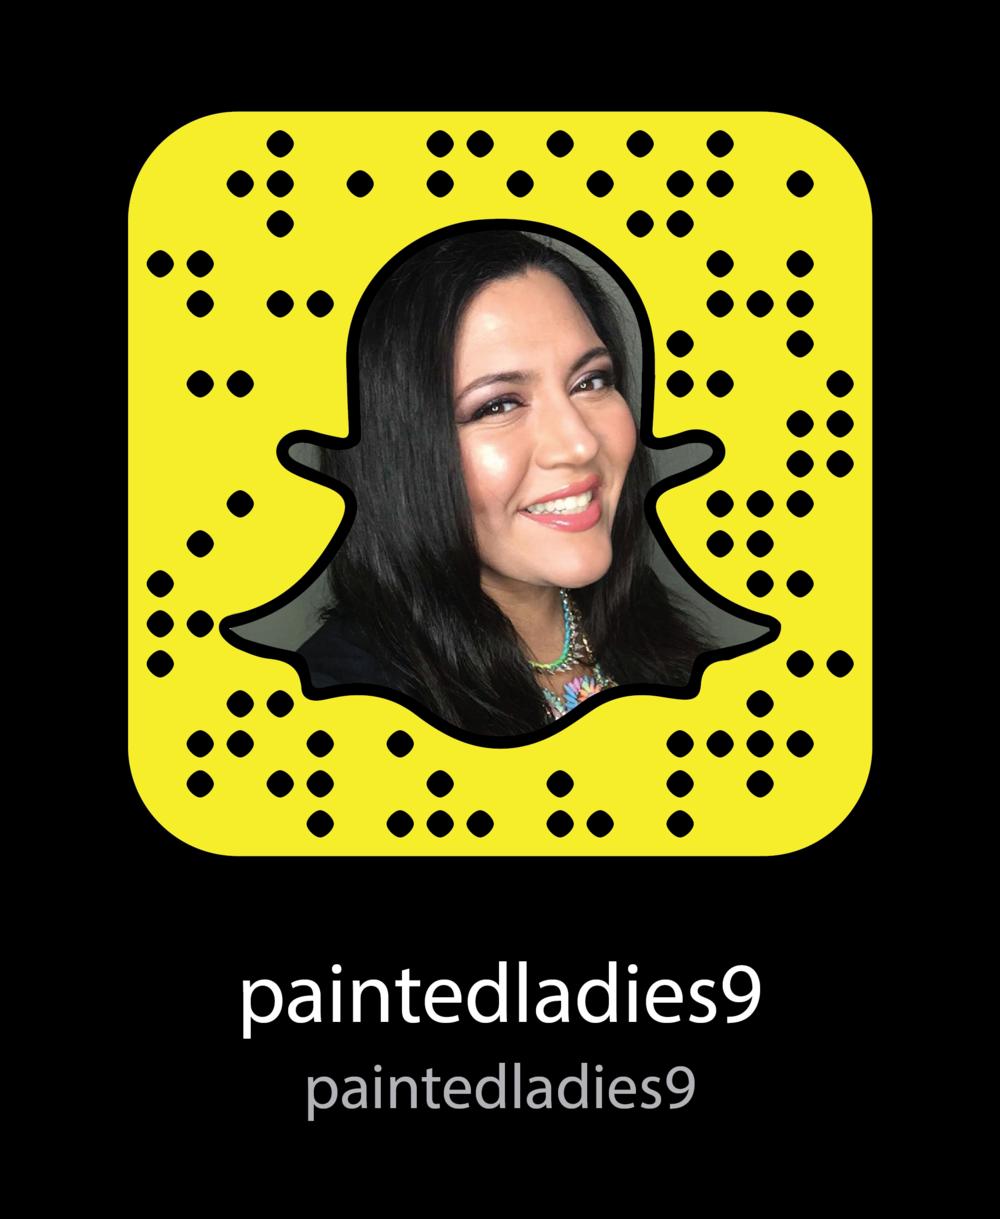 PaintedLadies9-Beauty-Bloggers-snapchat-snapcode.png